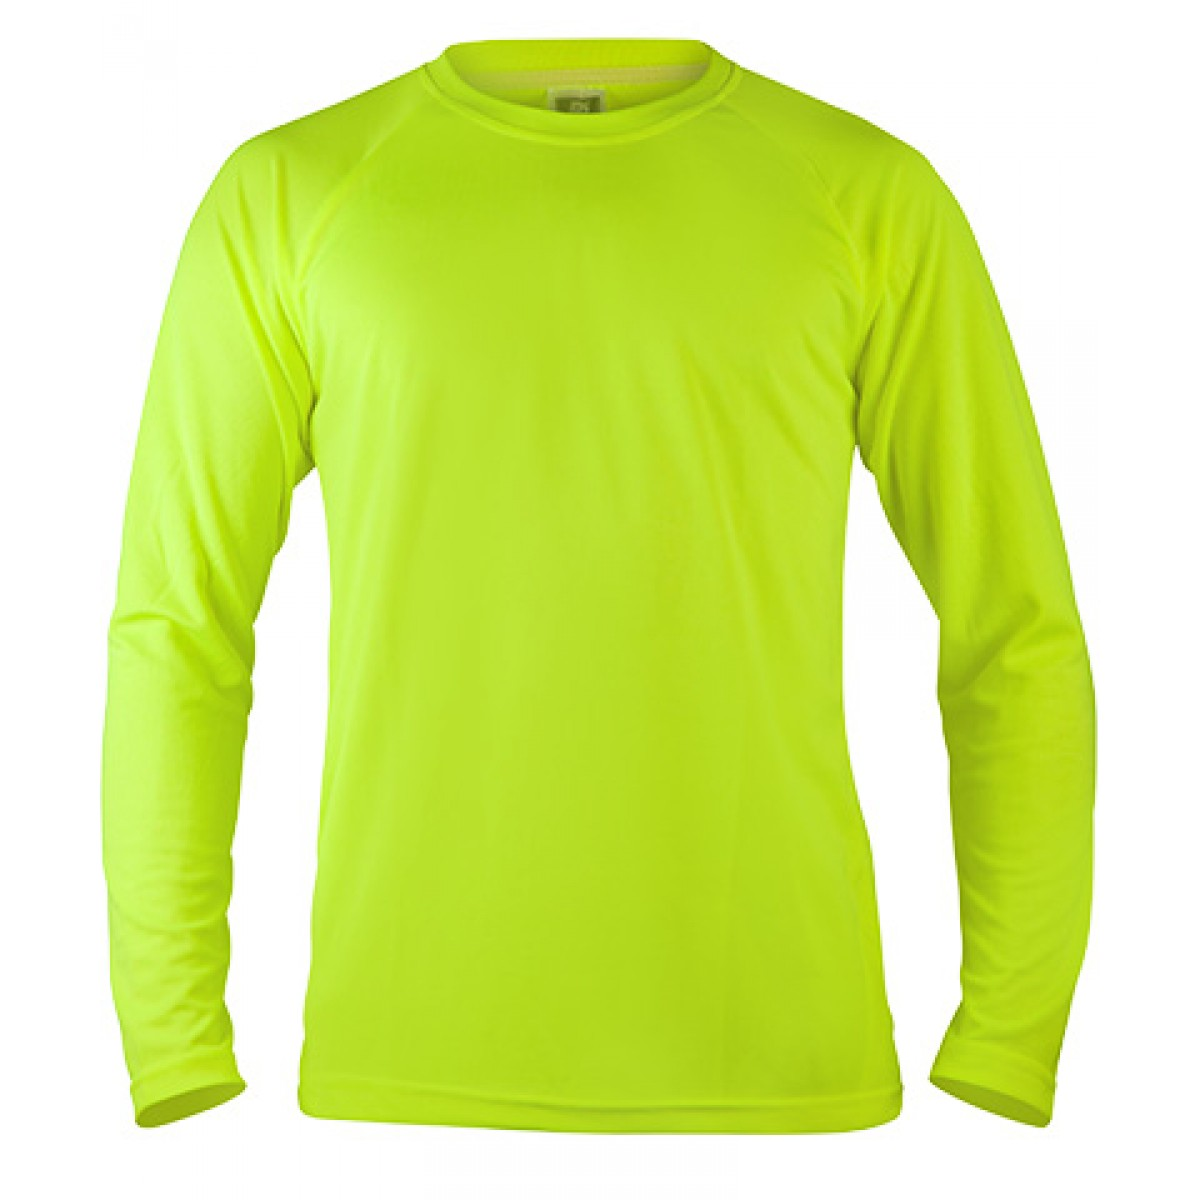 Long Sleeve Mesh Performance T-shirt-Neon Green-YM